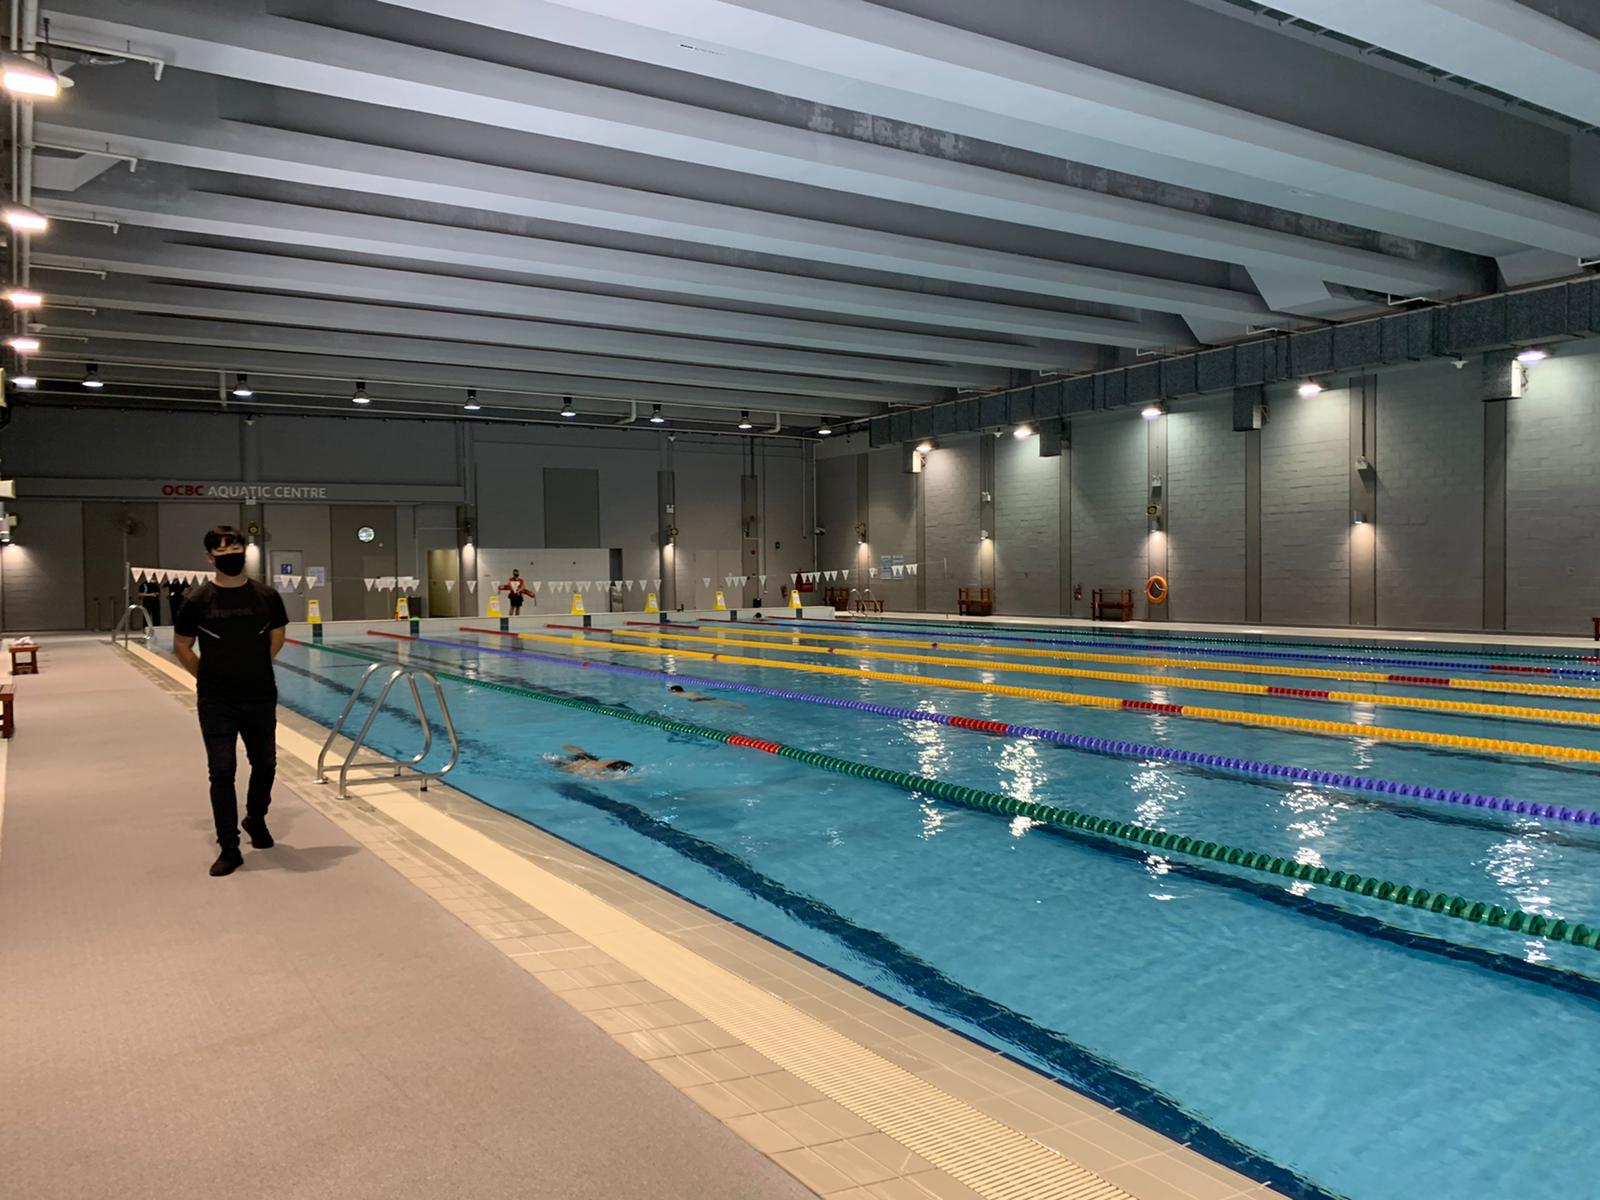 Singapore Sports Hub – OCBC Aquatic Centre